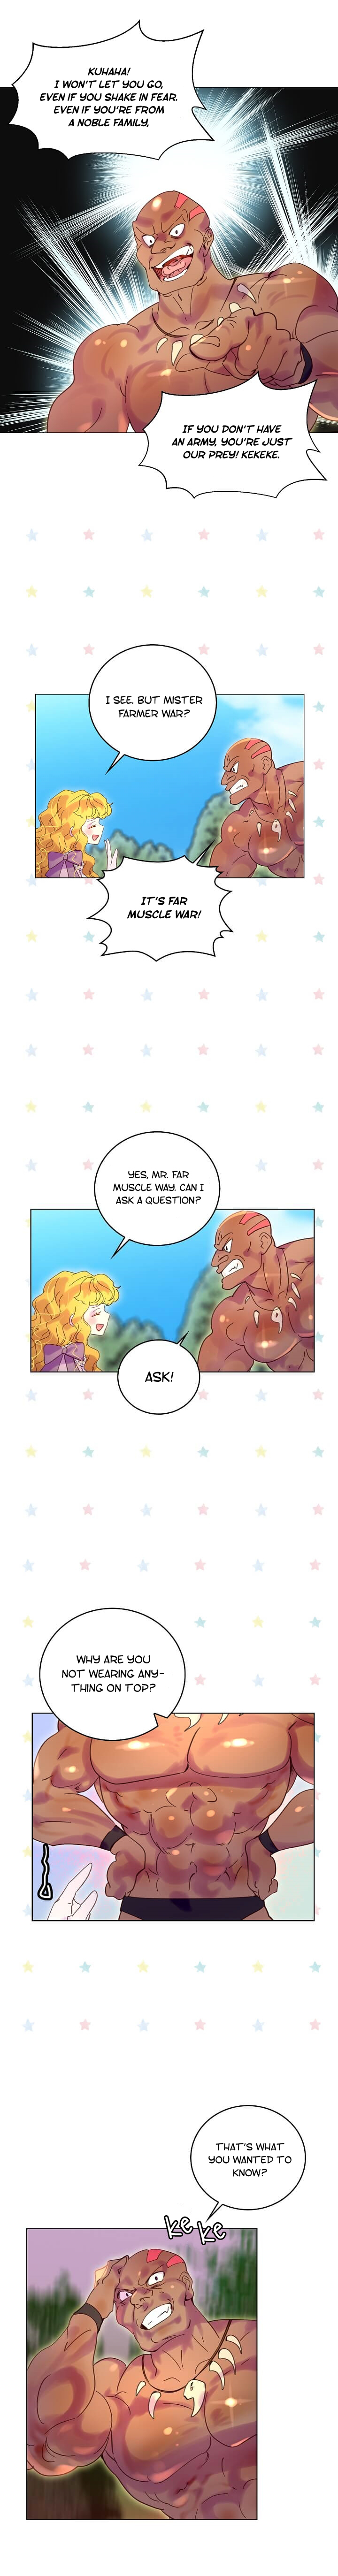 https://img2.nineanime.com/comics/pic2/43/27115/1254421/e53de2bed06ebcb1bbfaec7fb064f24b.jpg Page 2